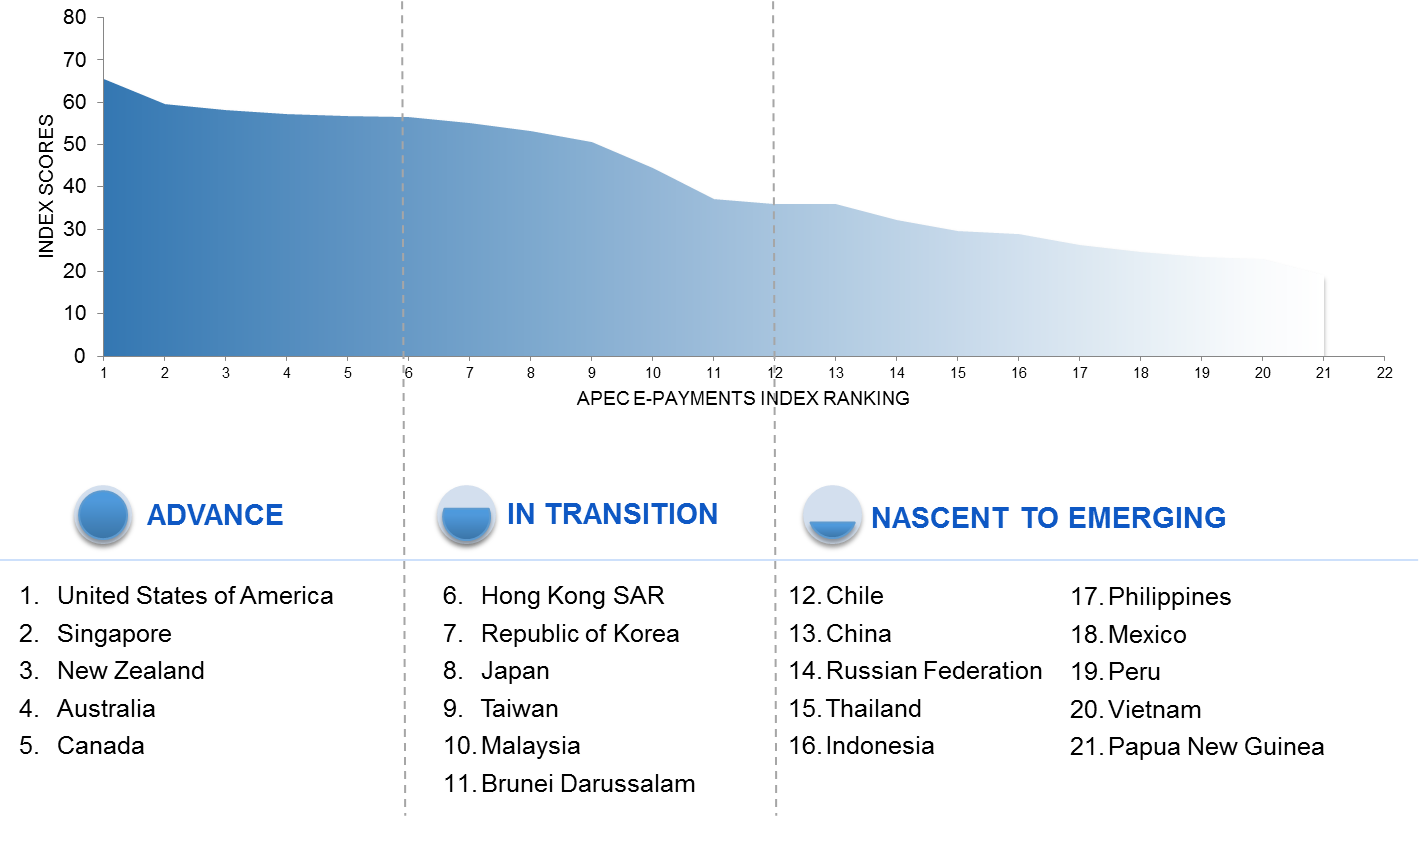 APEC E-payment Index clusters